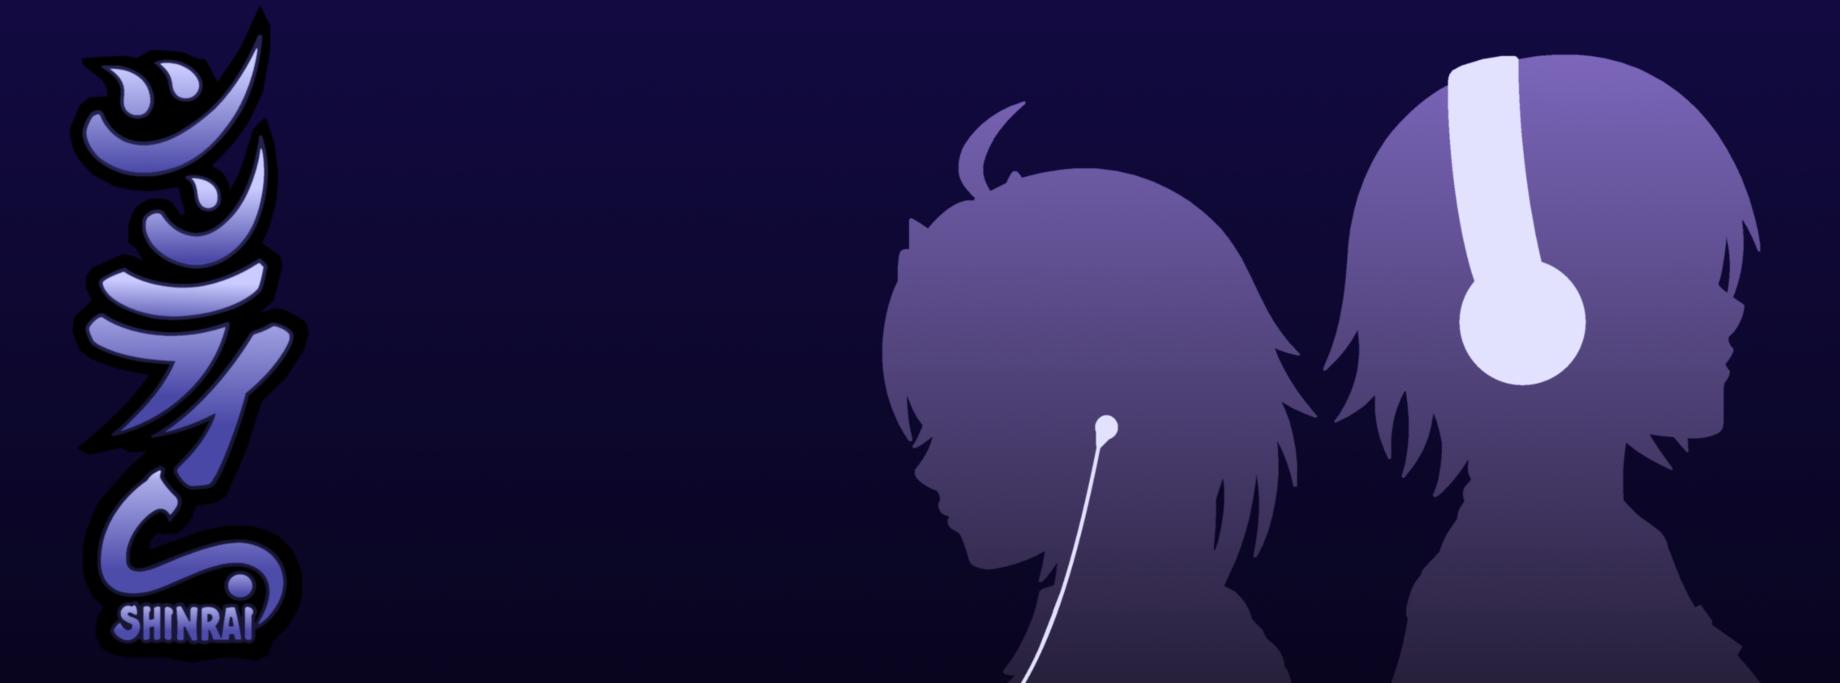 SHINRAI - Broken Beyond Despair Soundtrack